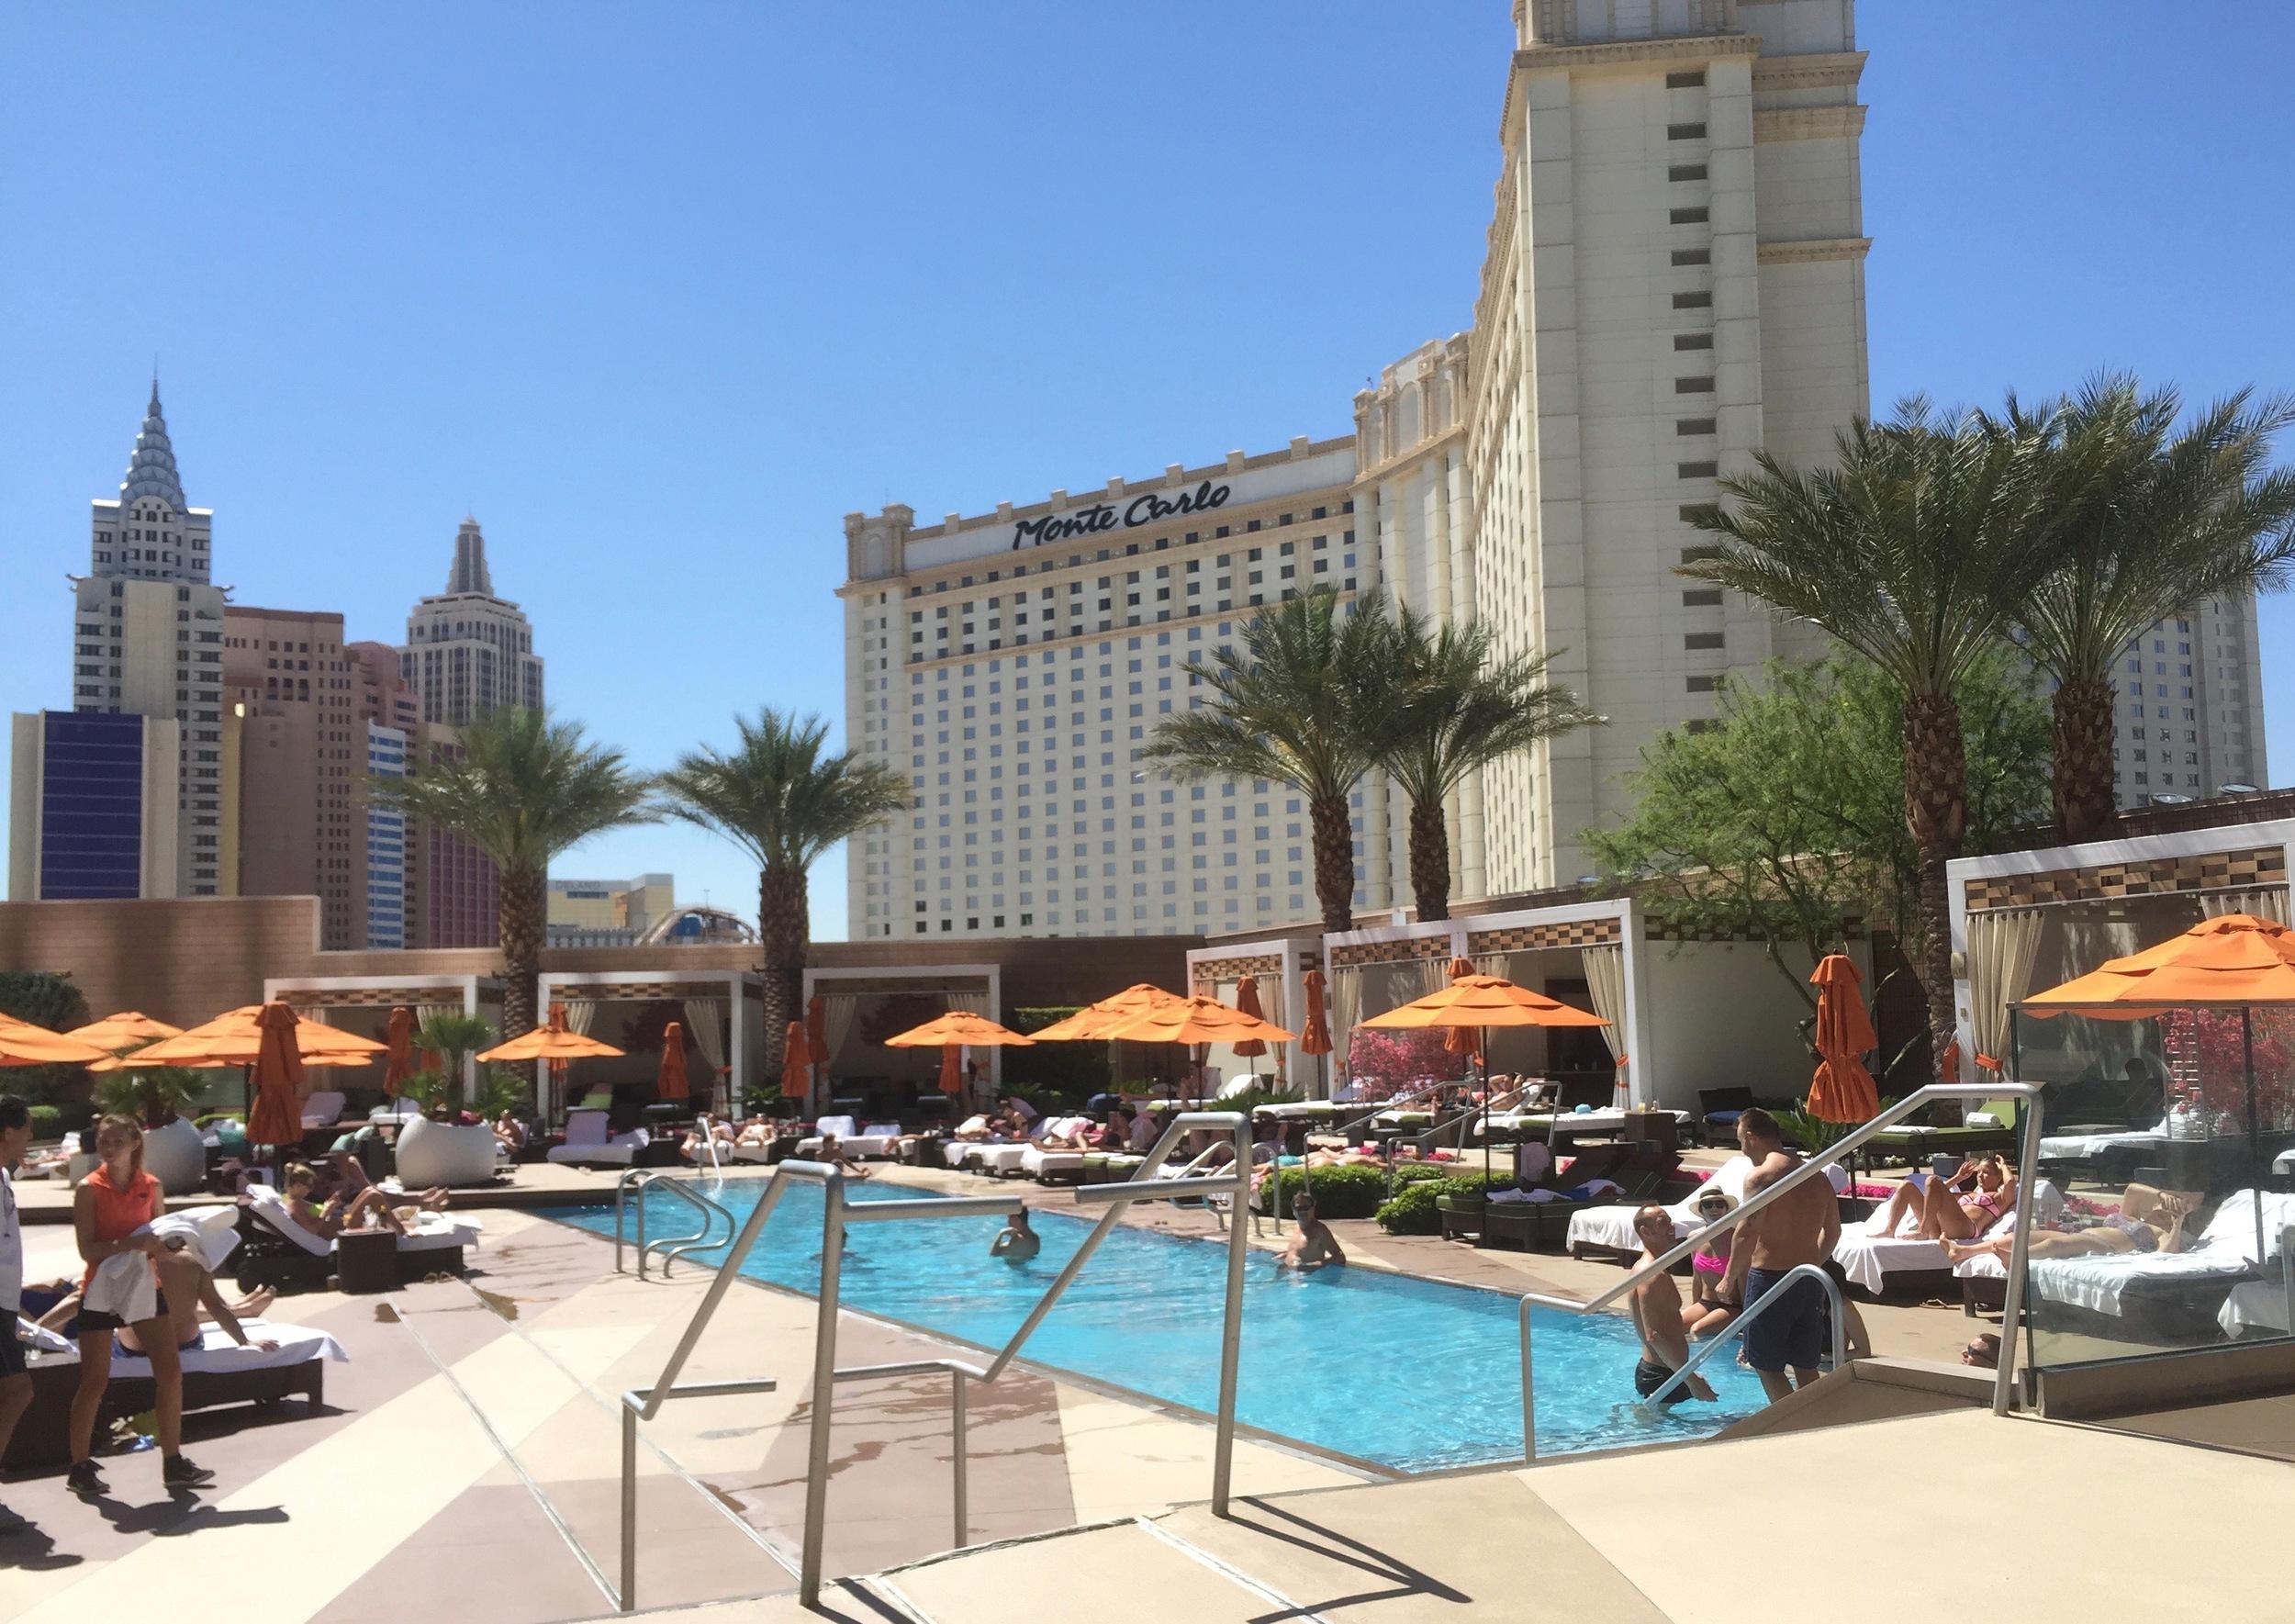 Mandarin Oriental Poolside...live a little!